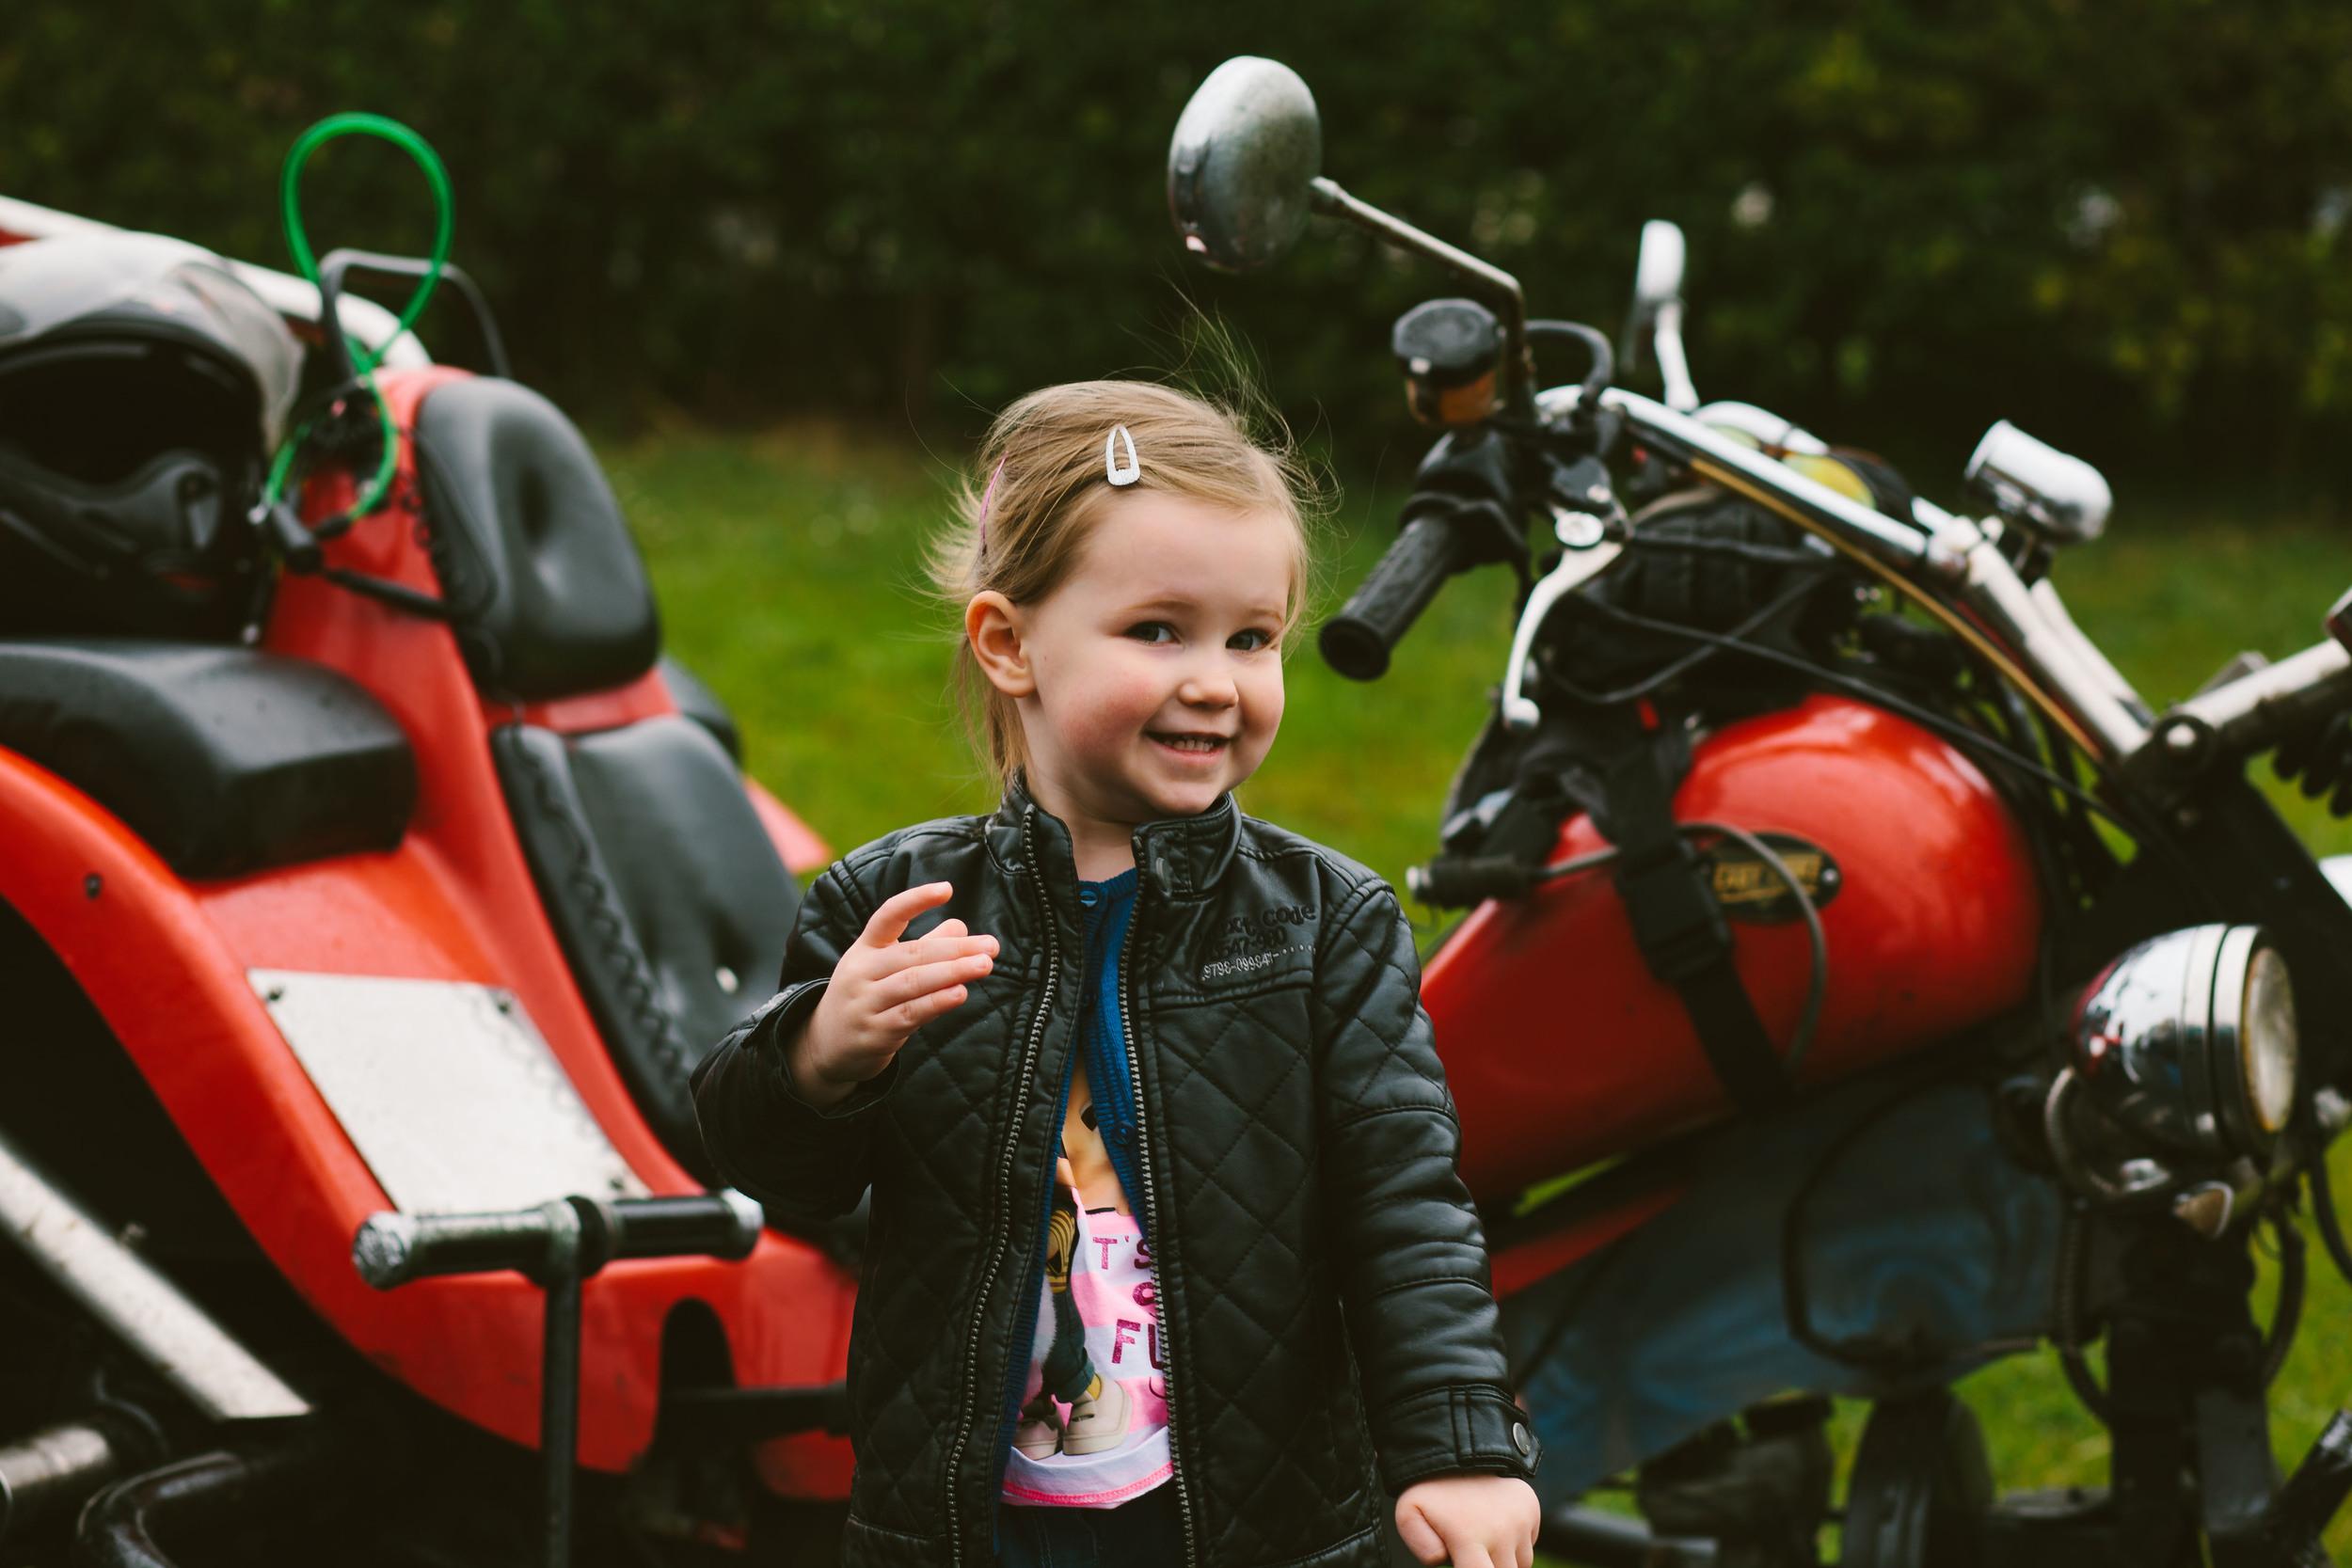 Grandad's Trike Ride-0006.jpg